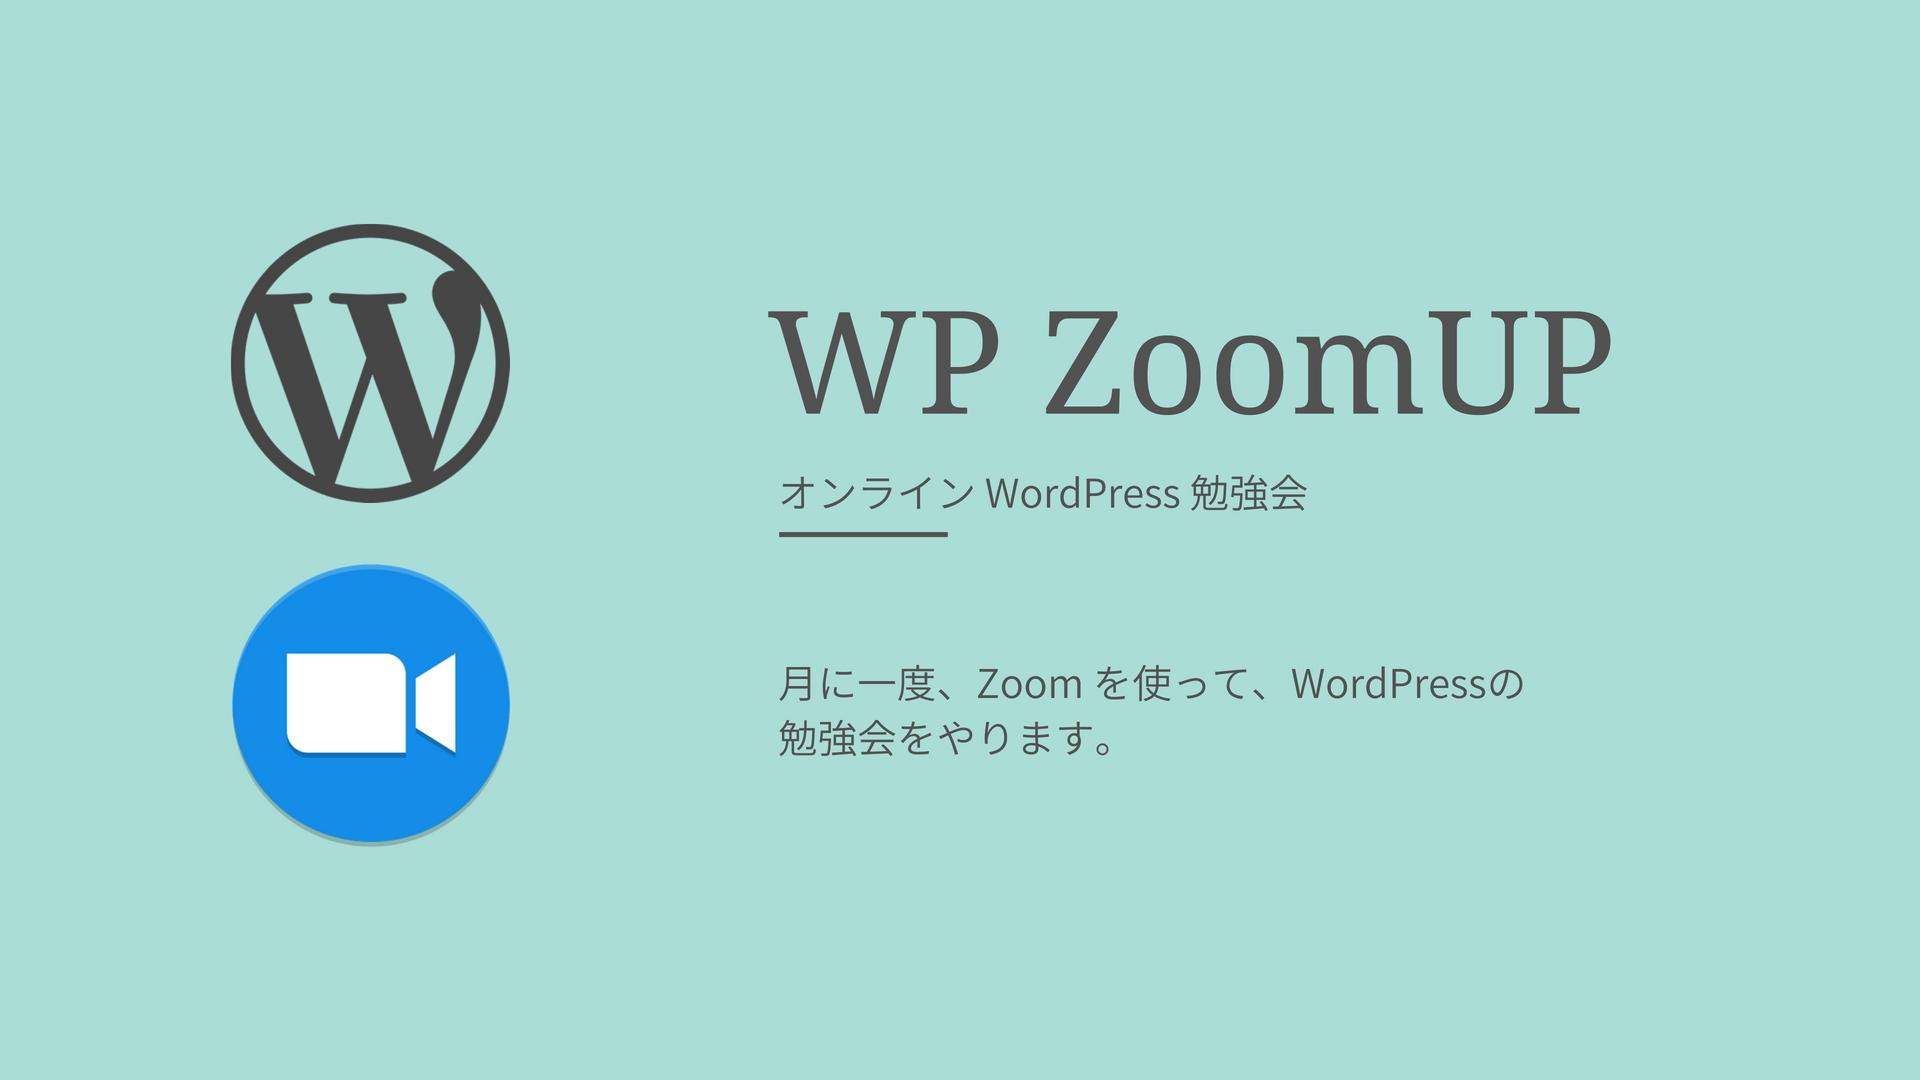 WP ZoomUP (1)